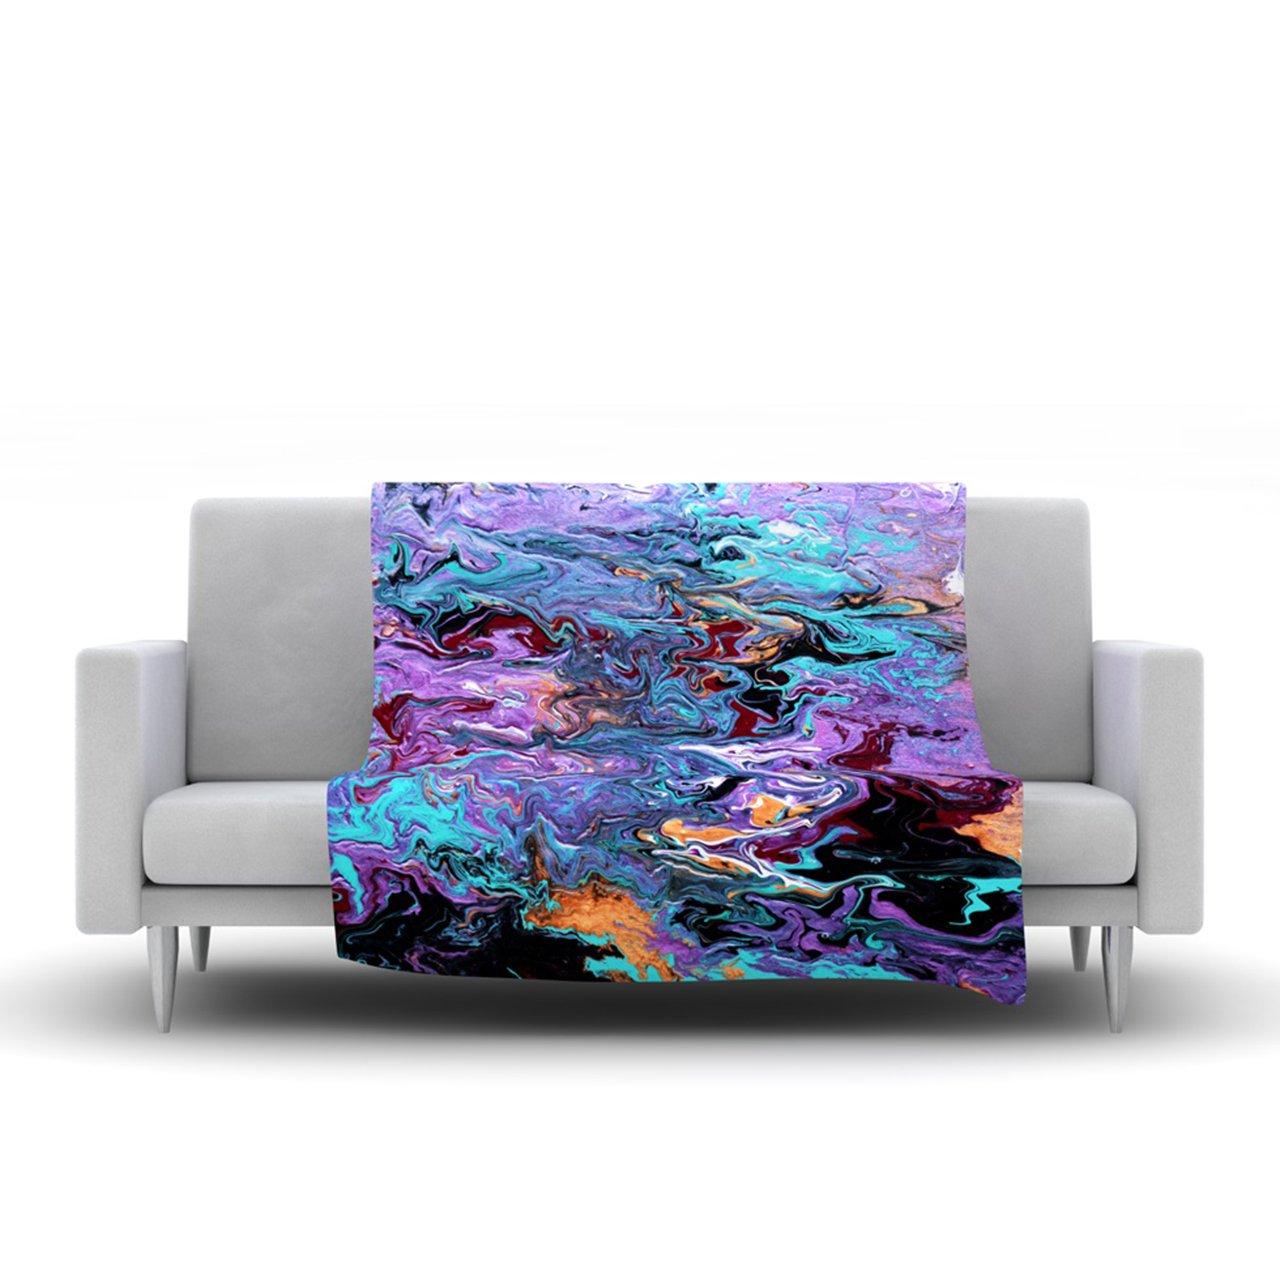 Kess InHouse Claire Day Lola Purple Paint Fleece Throw Blanket 80 by 60